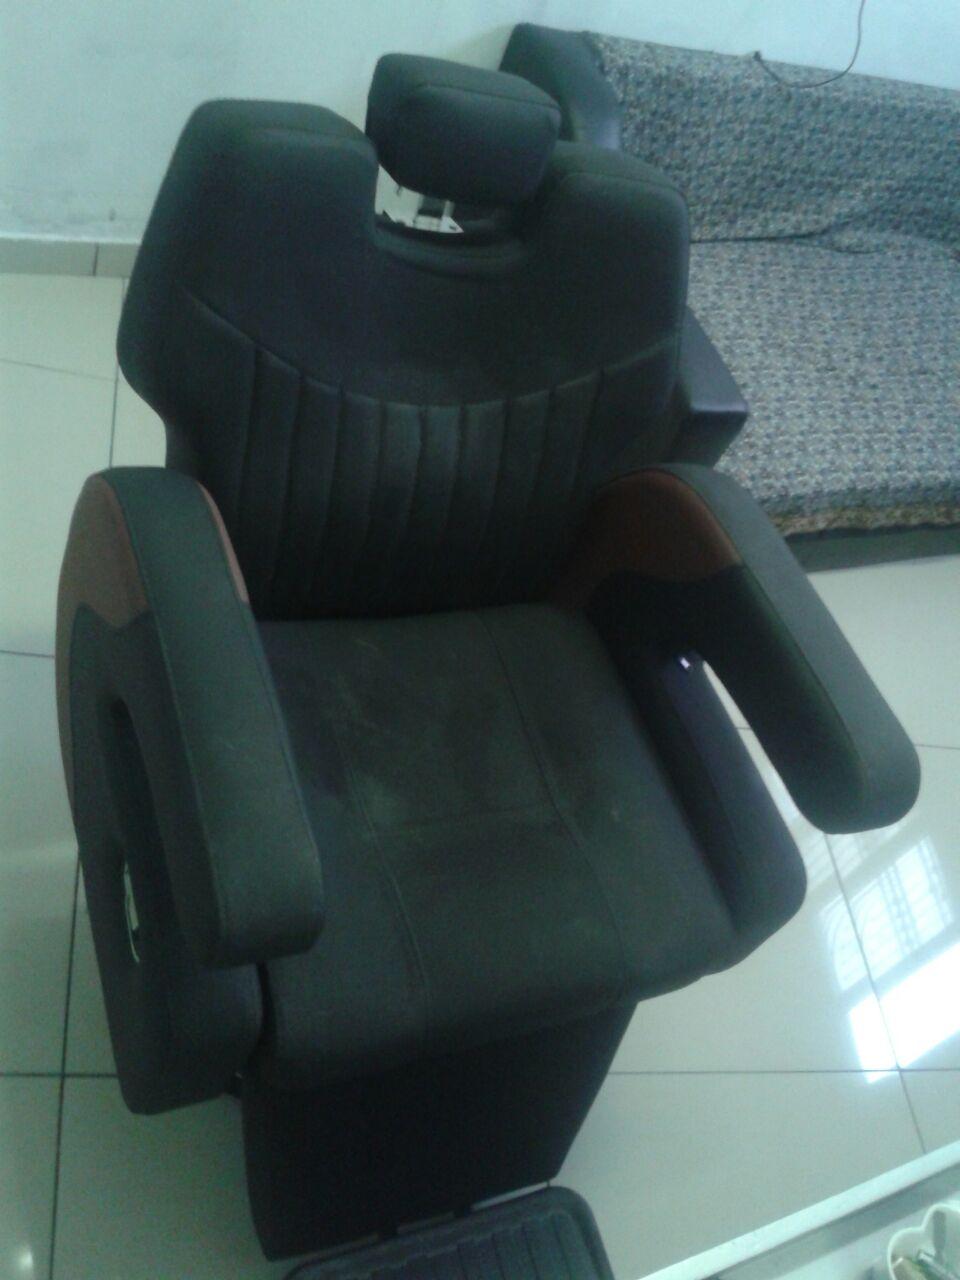 Pneumatic Barber chair